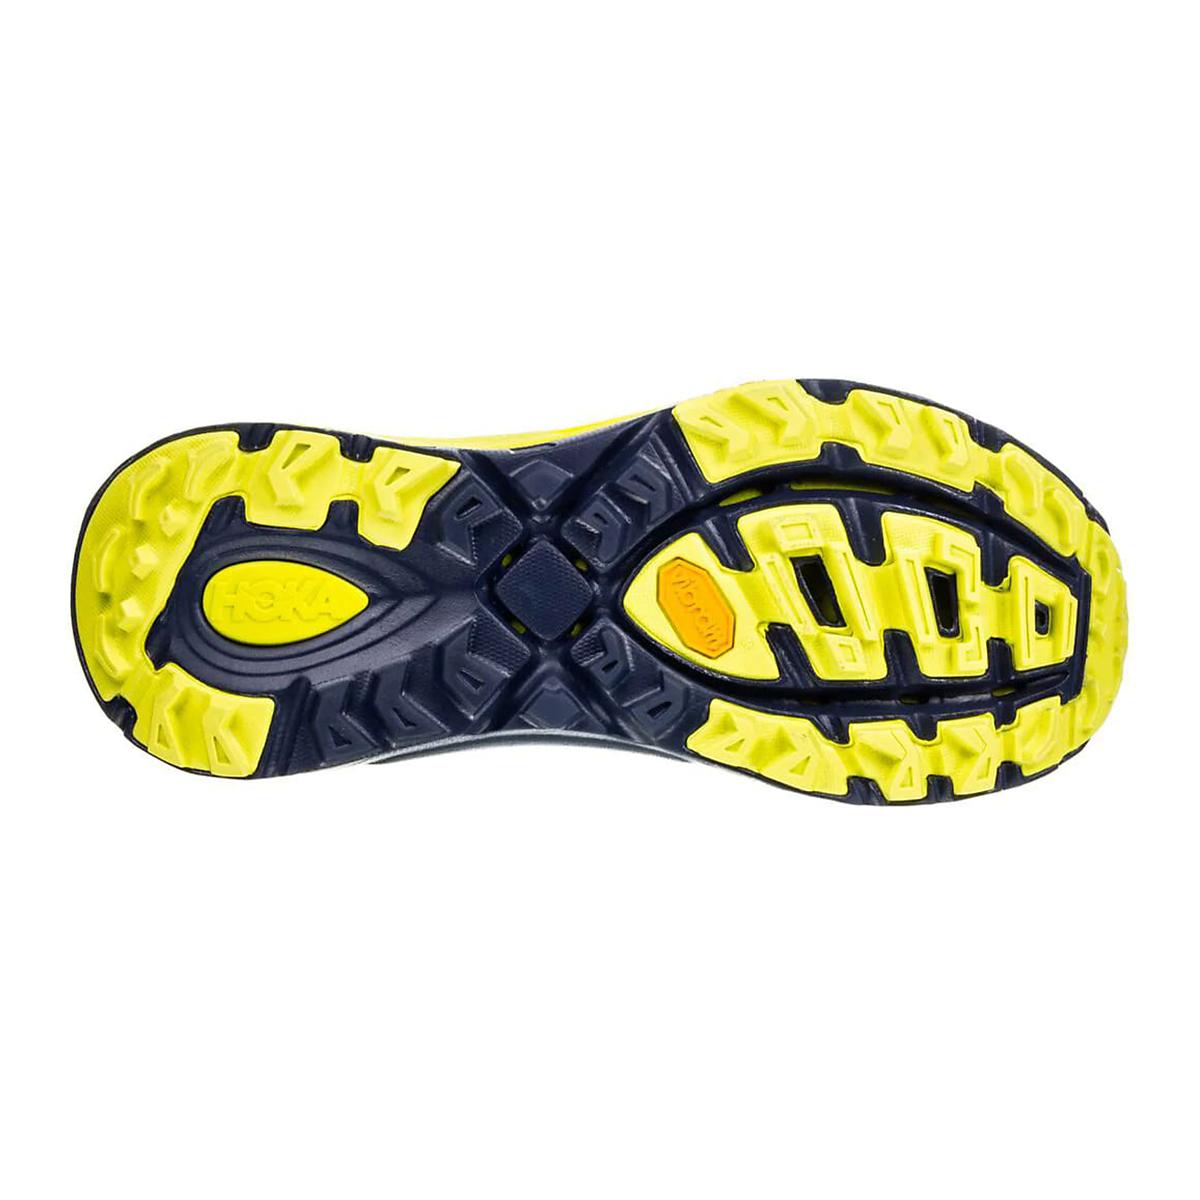 Men's Hoka One One Evo Mafate 2 Running Shoe - Color: Cyan/Citrus - Size: 7 - Width: Regular, Cyan/Citrus, large, image 4